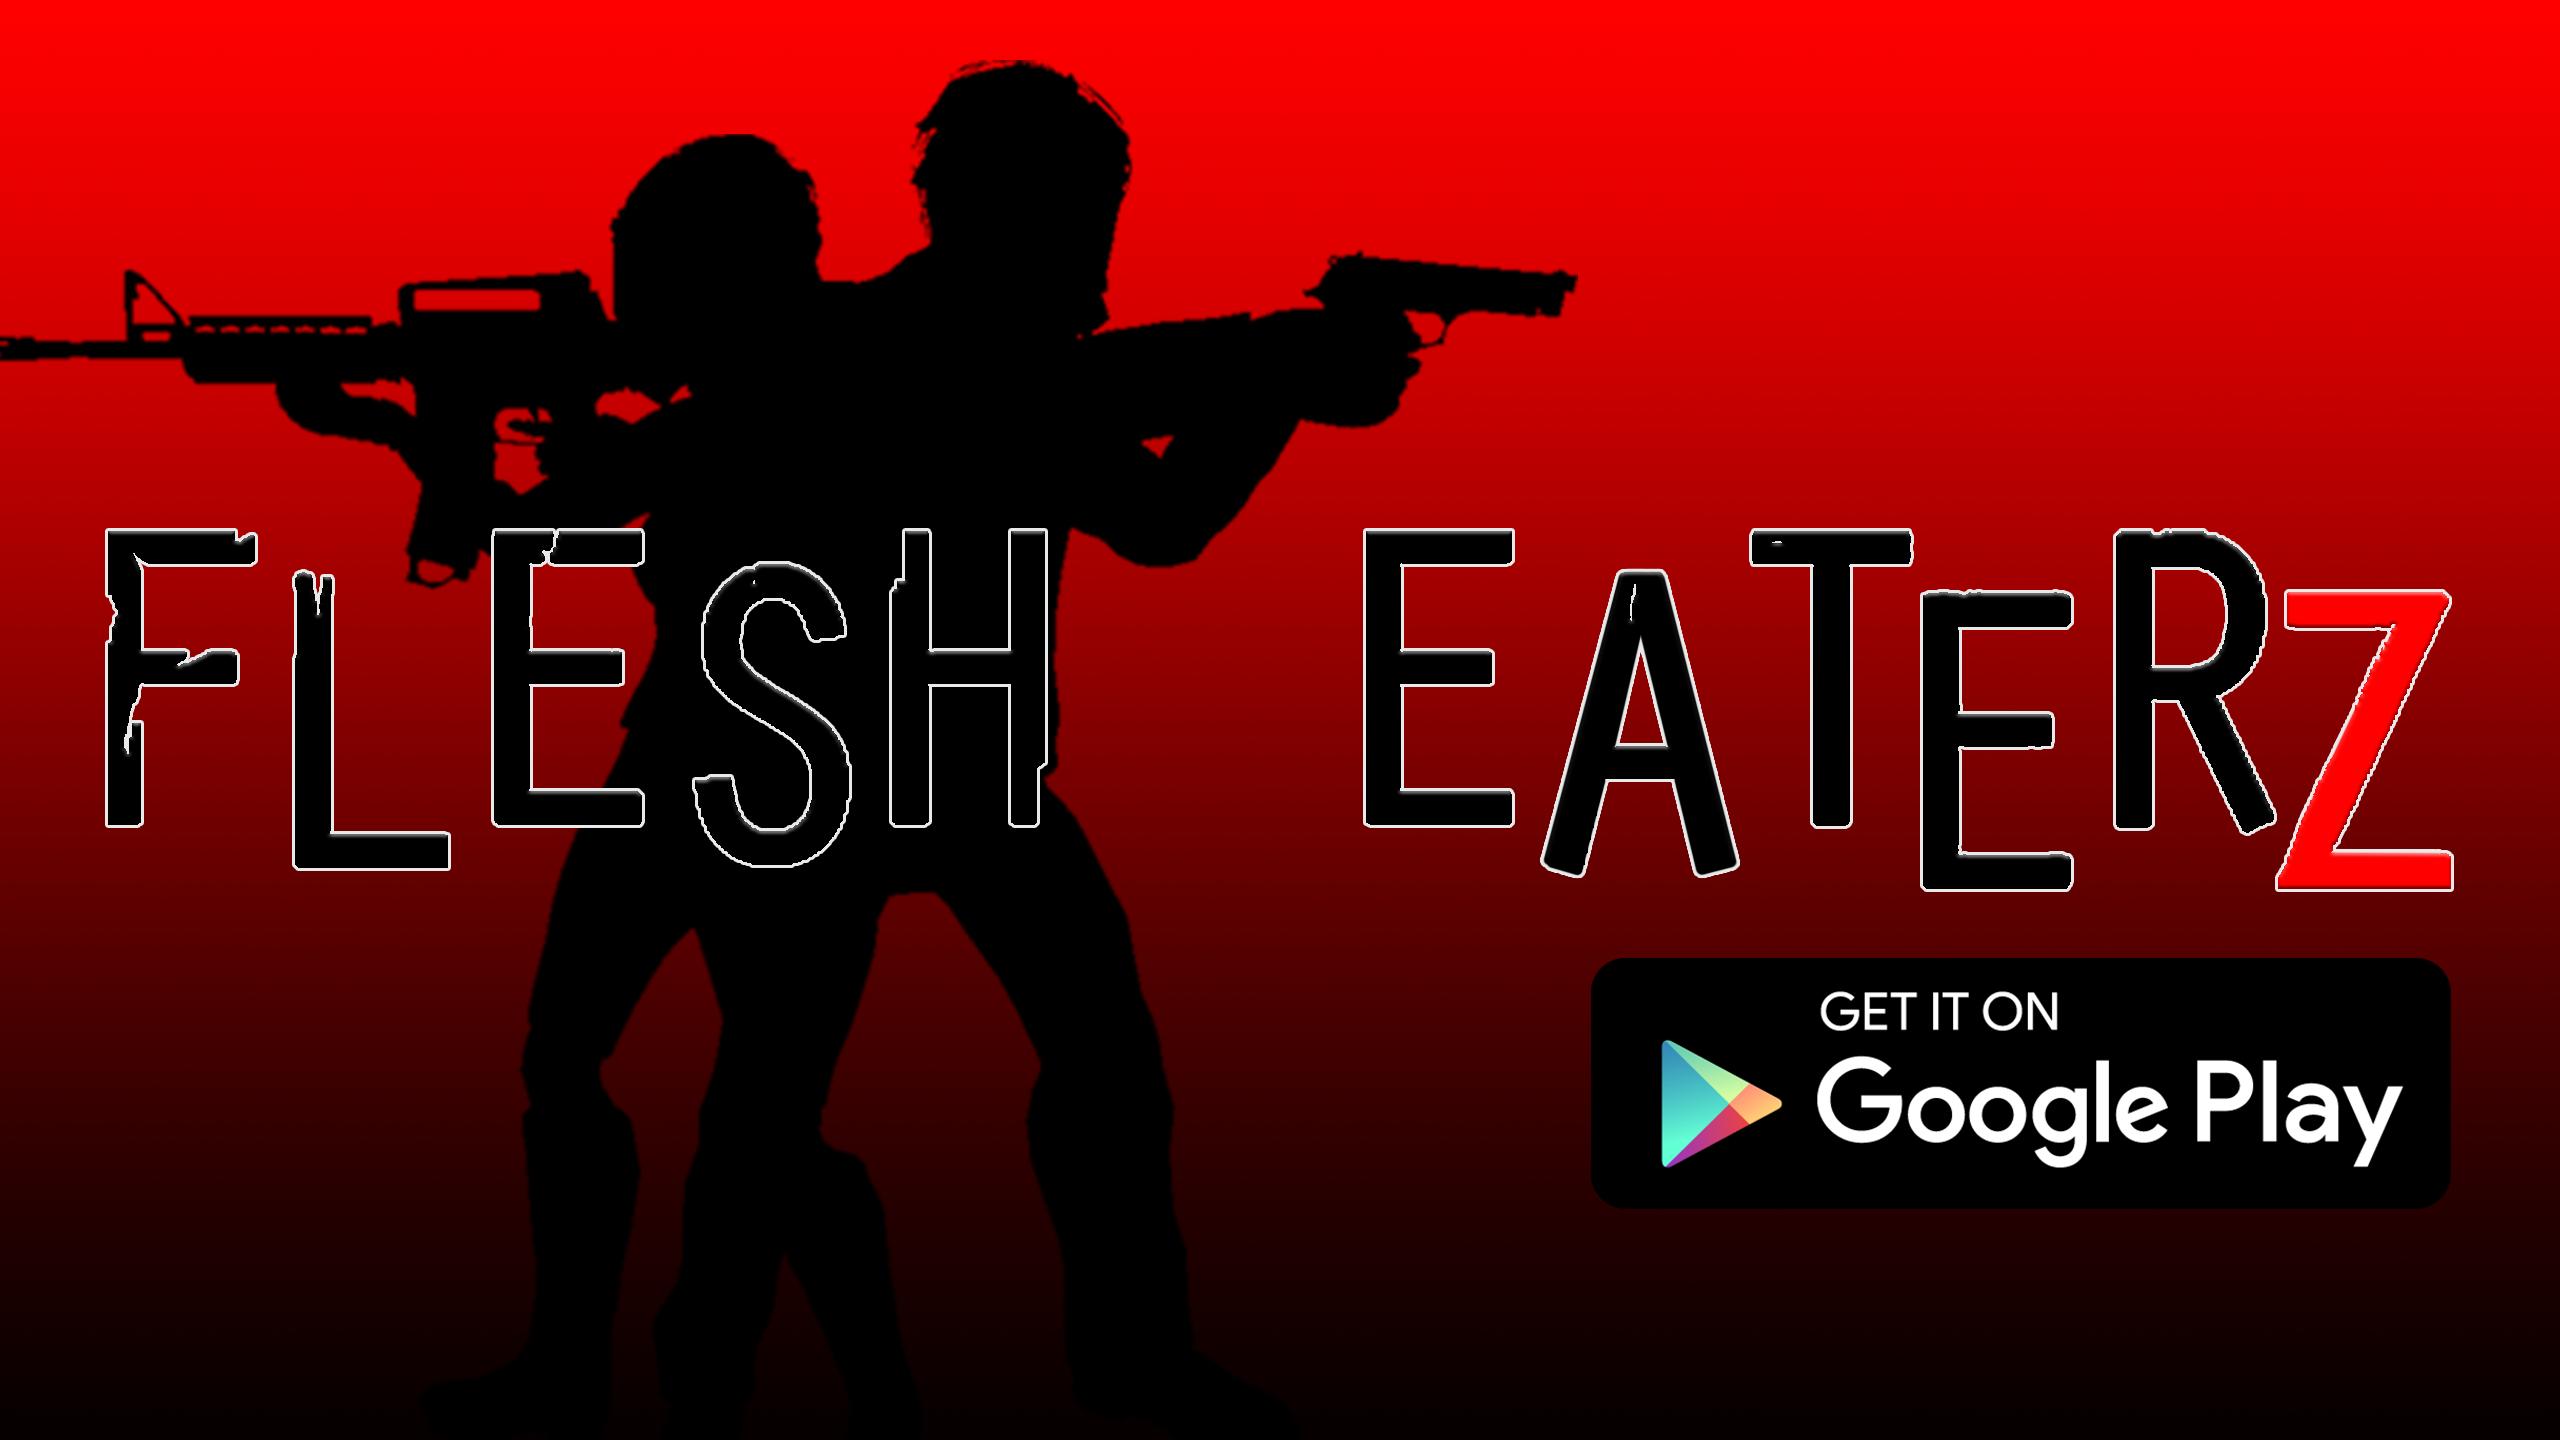 Flesh EaterZ